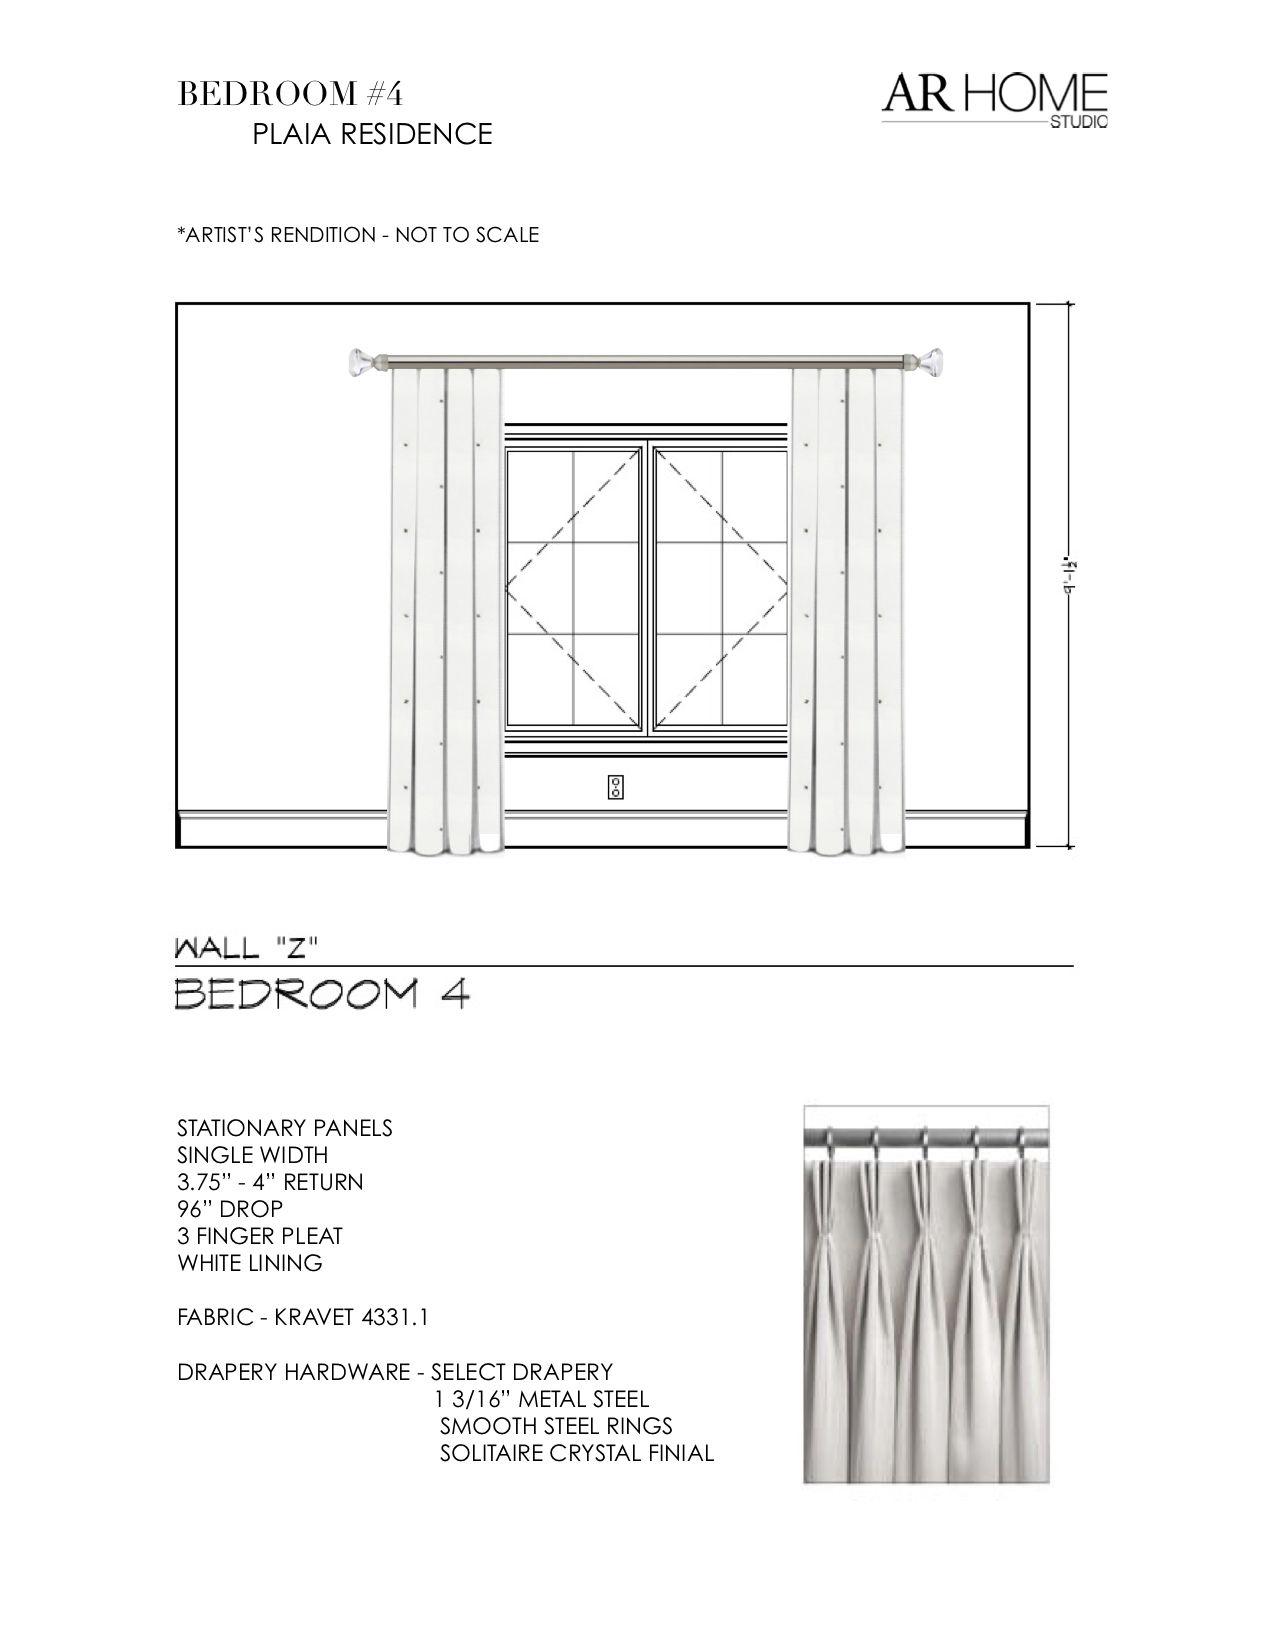 Bedroom #4 | Floor plans, Residences, Drapery hardware